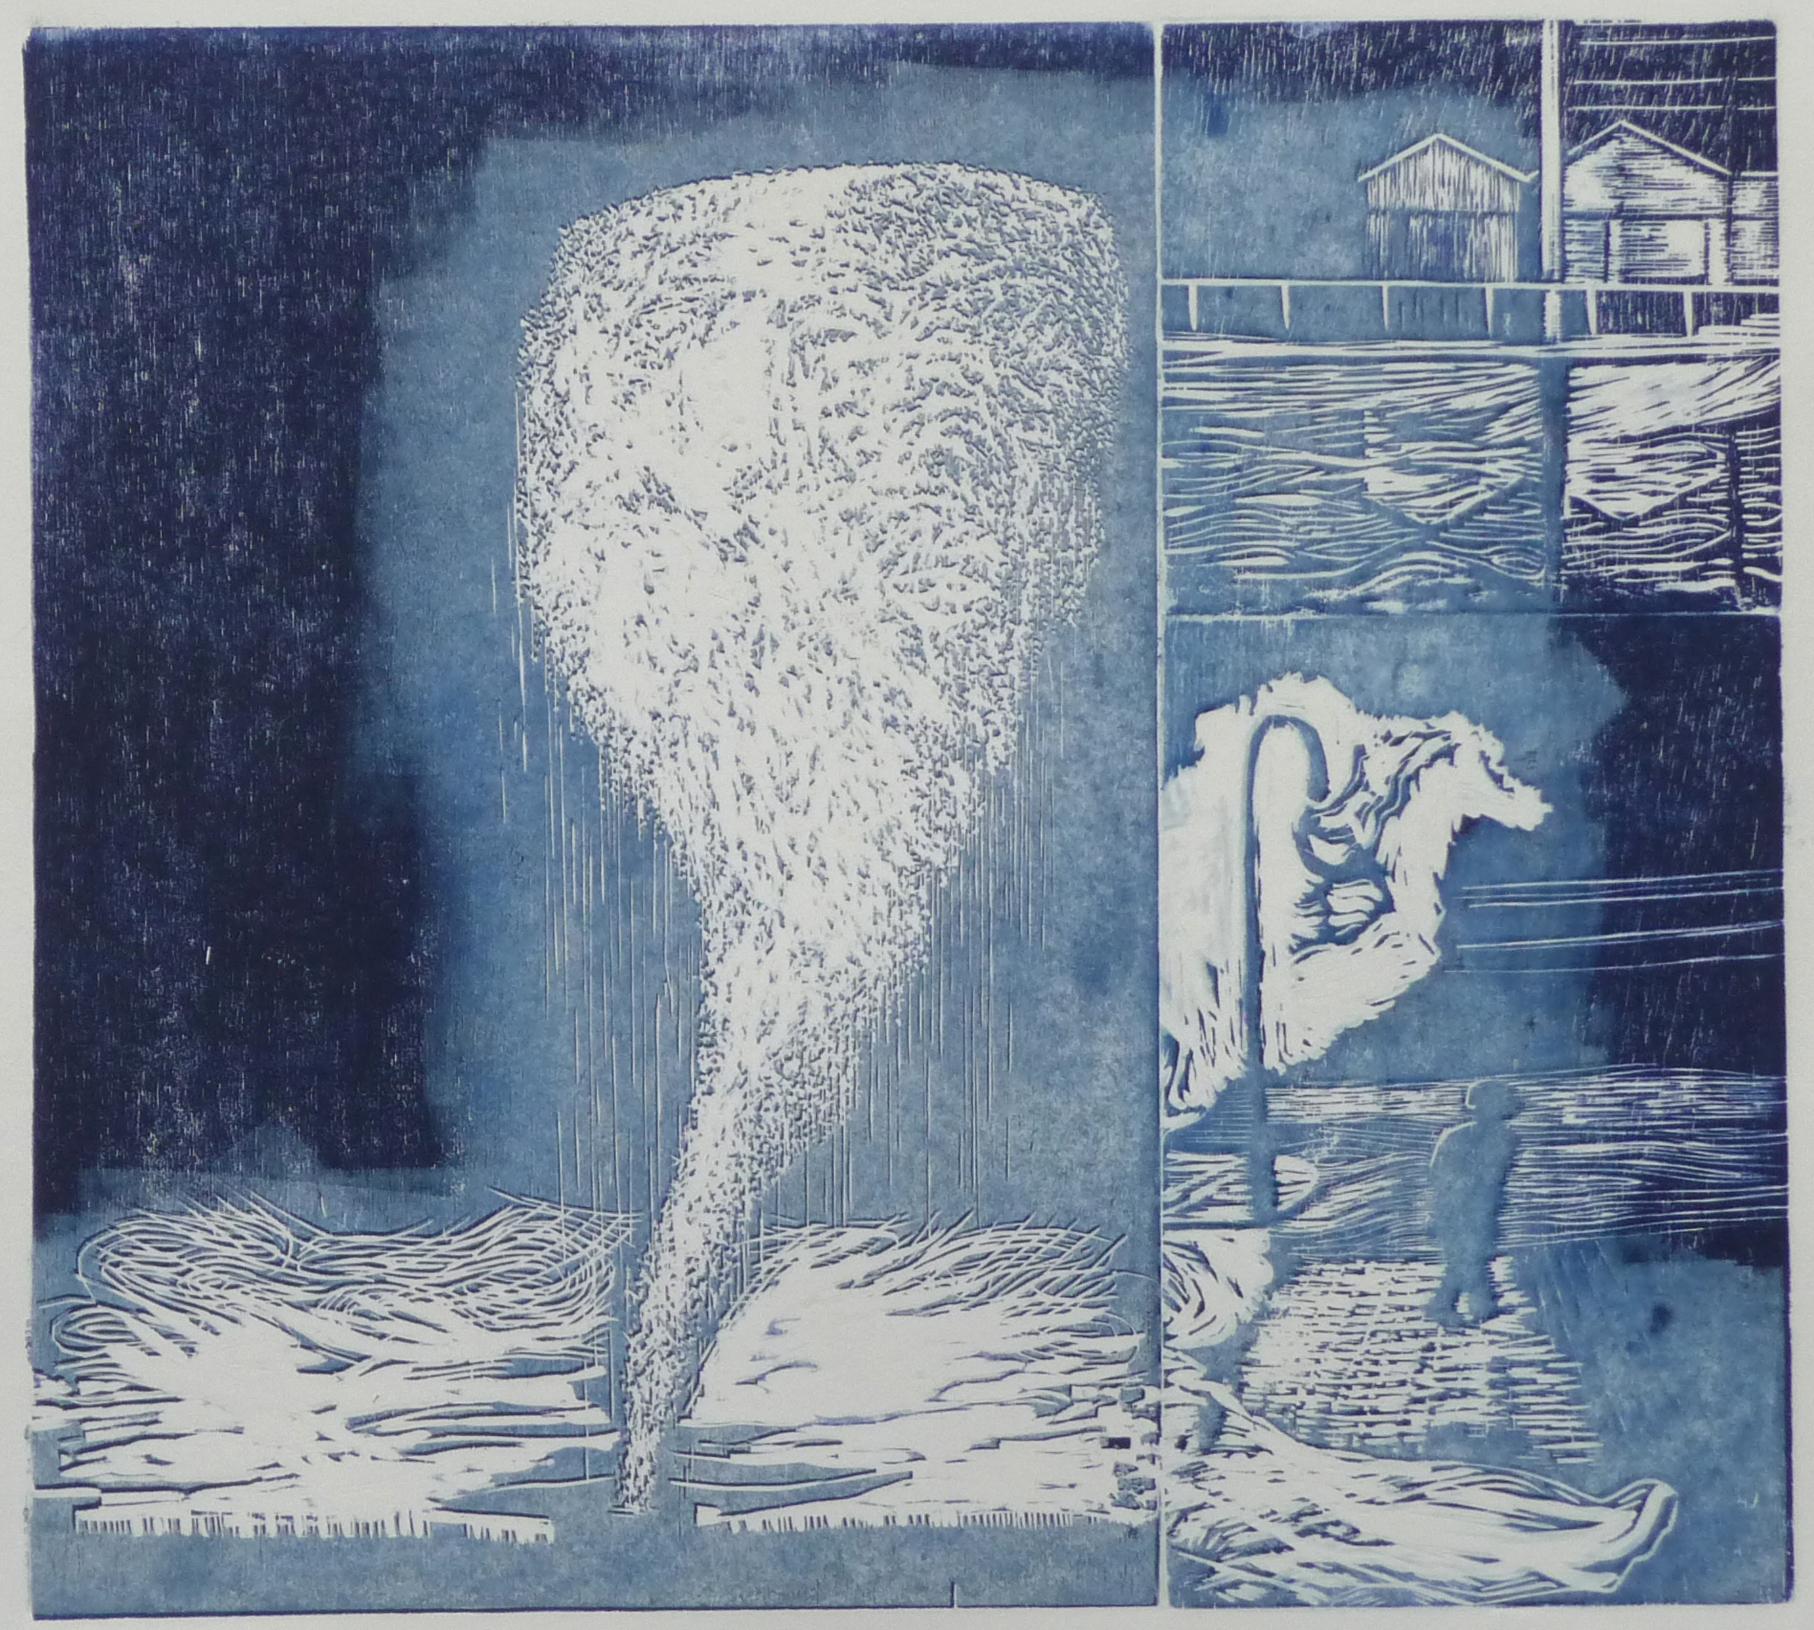 Tournado iii, woodcut, 43 x 47 cm, 2017